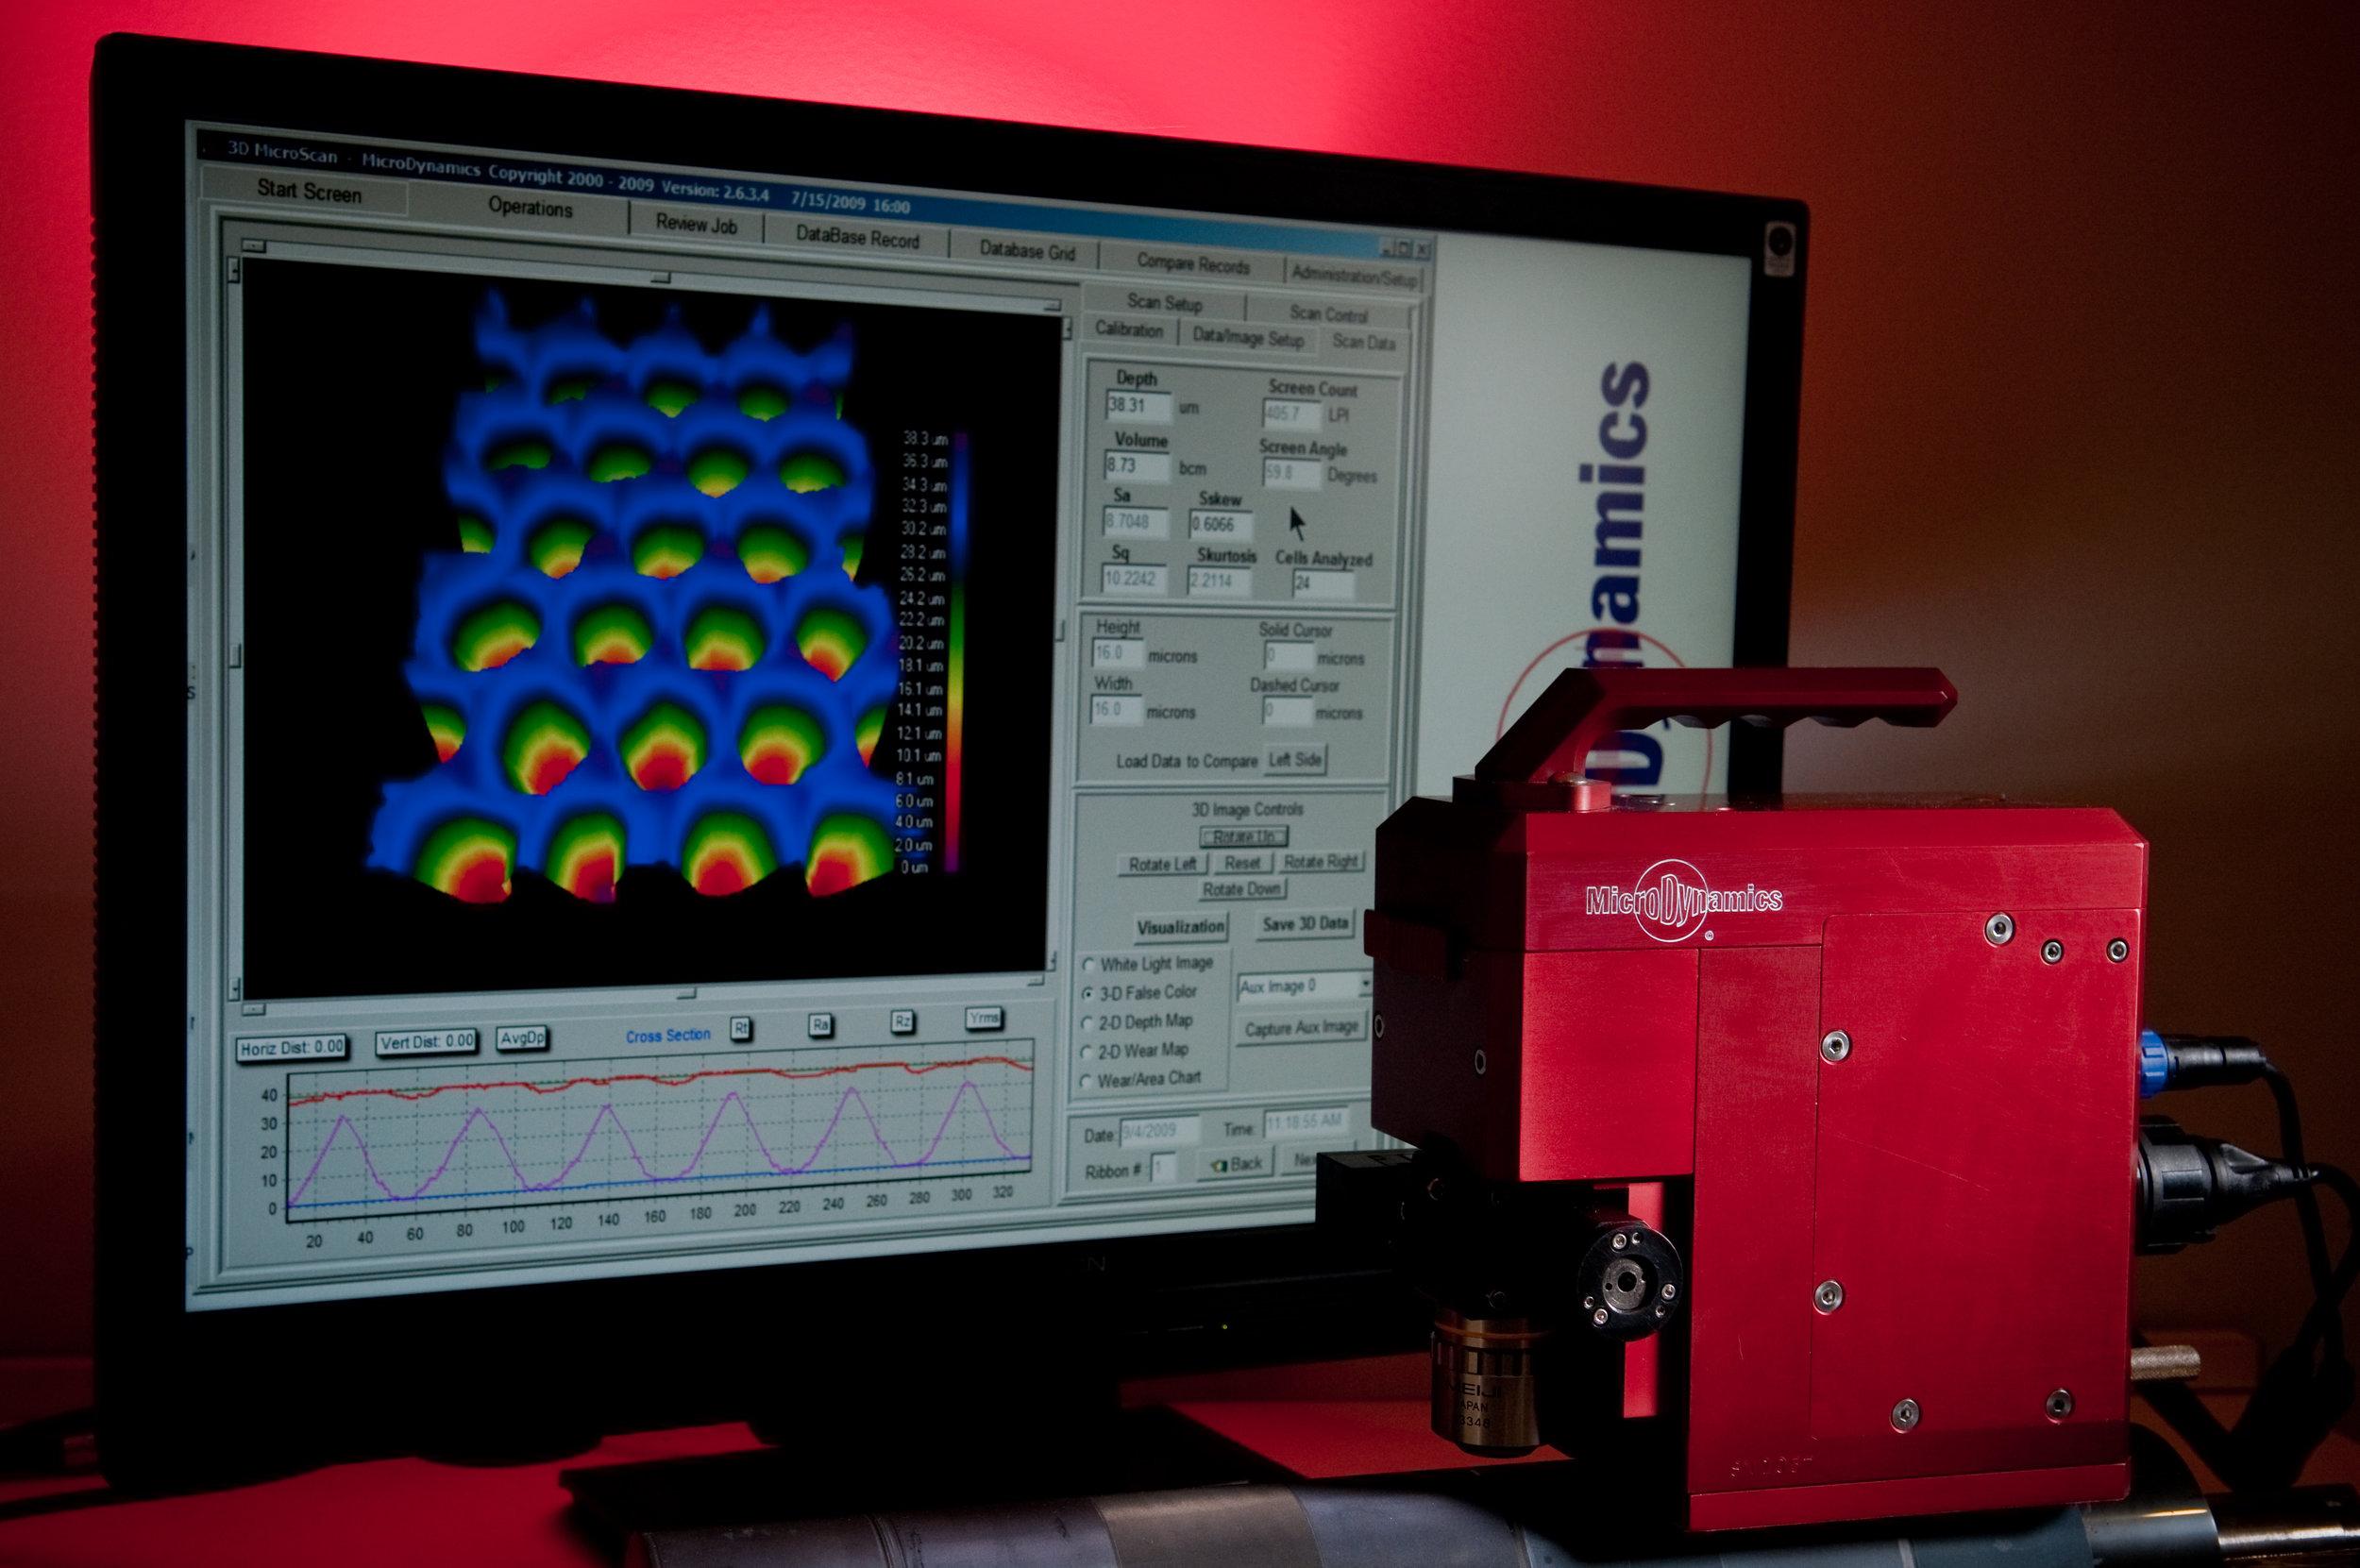 microdynamics_20090904_001.jpg